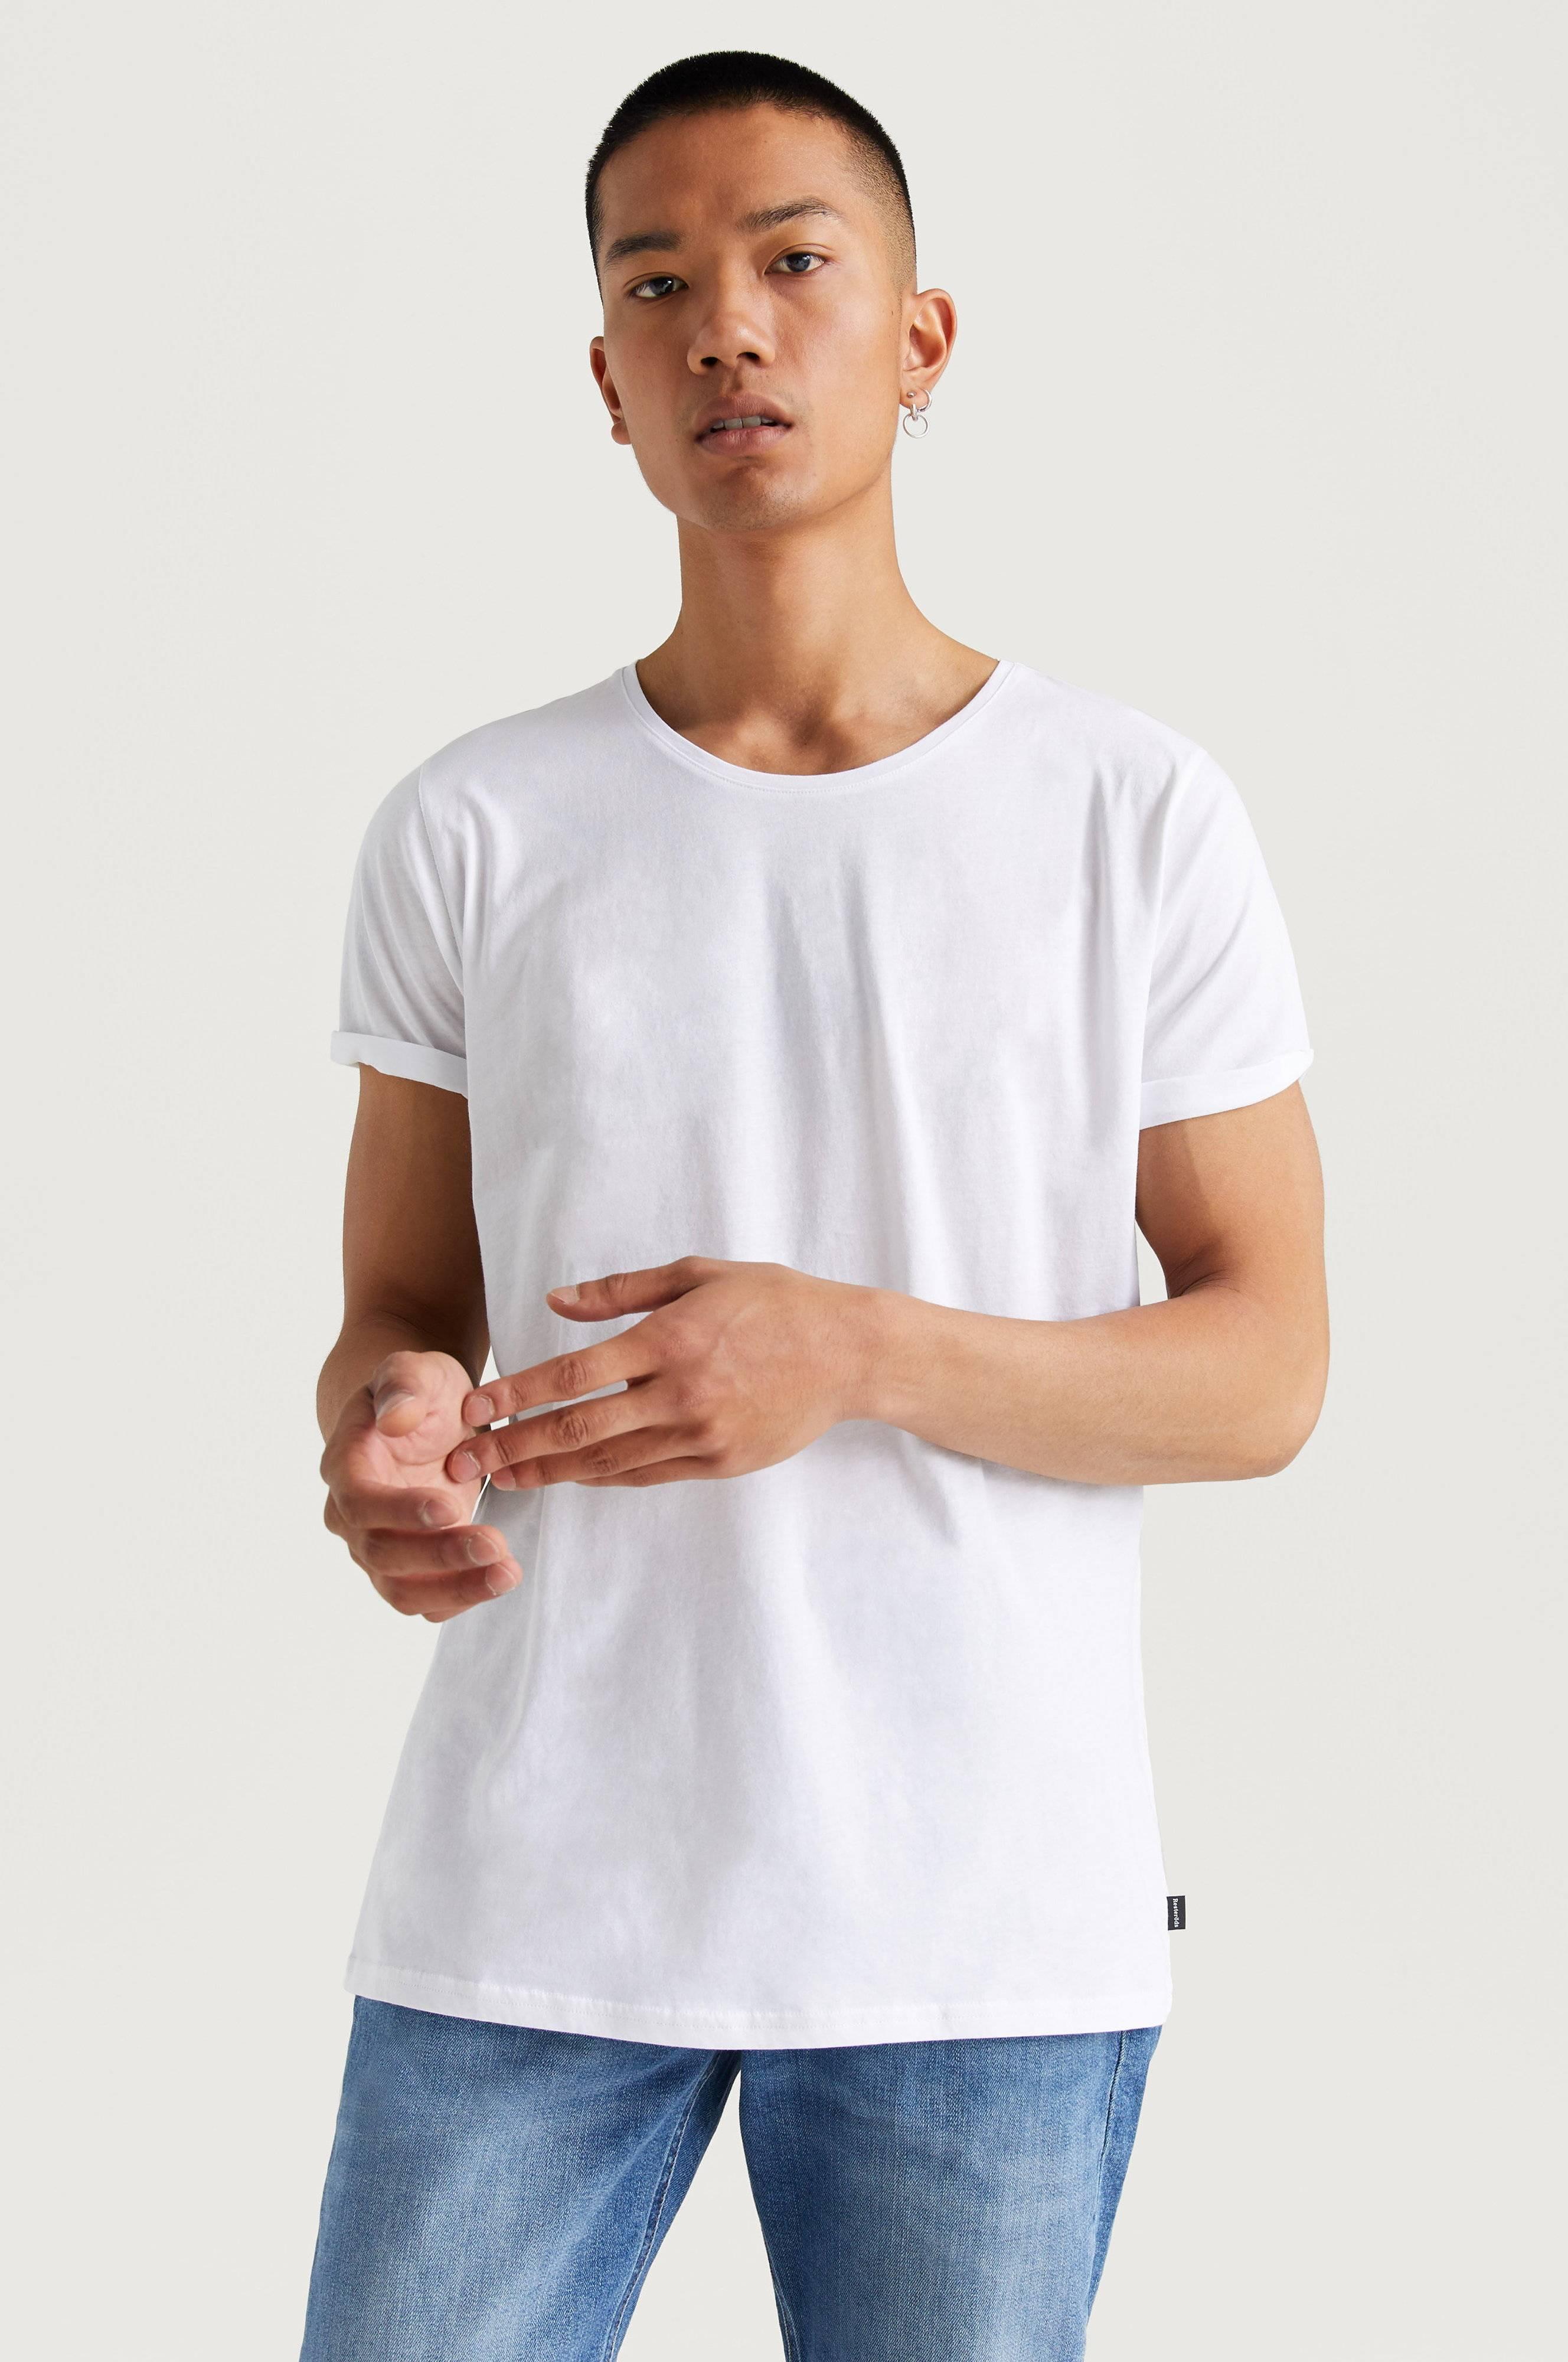 Resteröds T-shirt Jimmy Solid Tee Vit